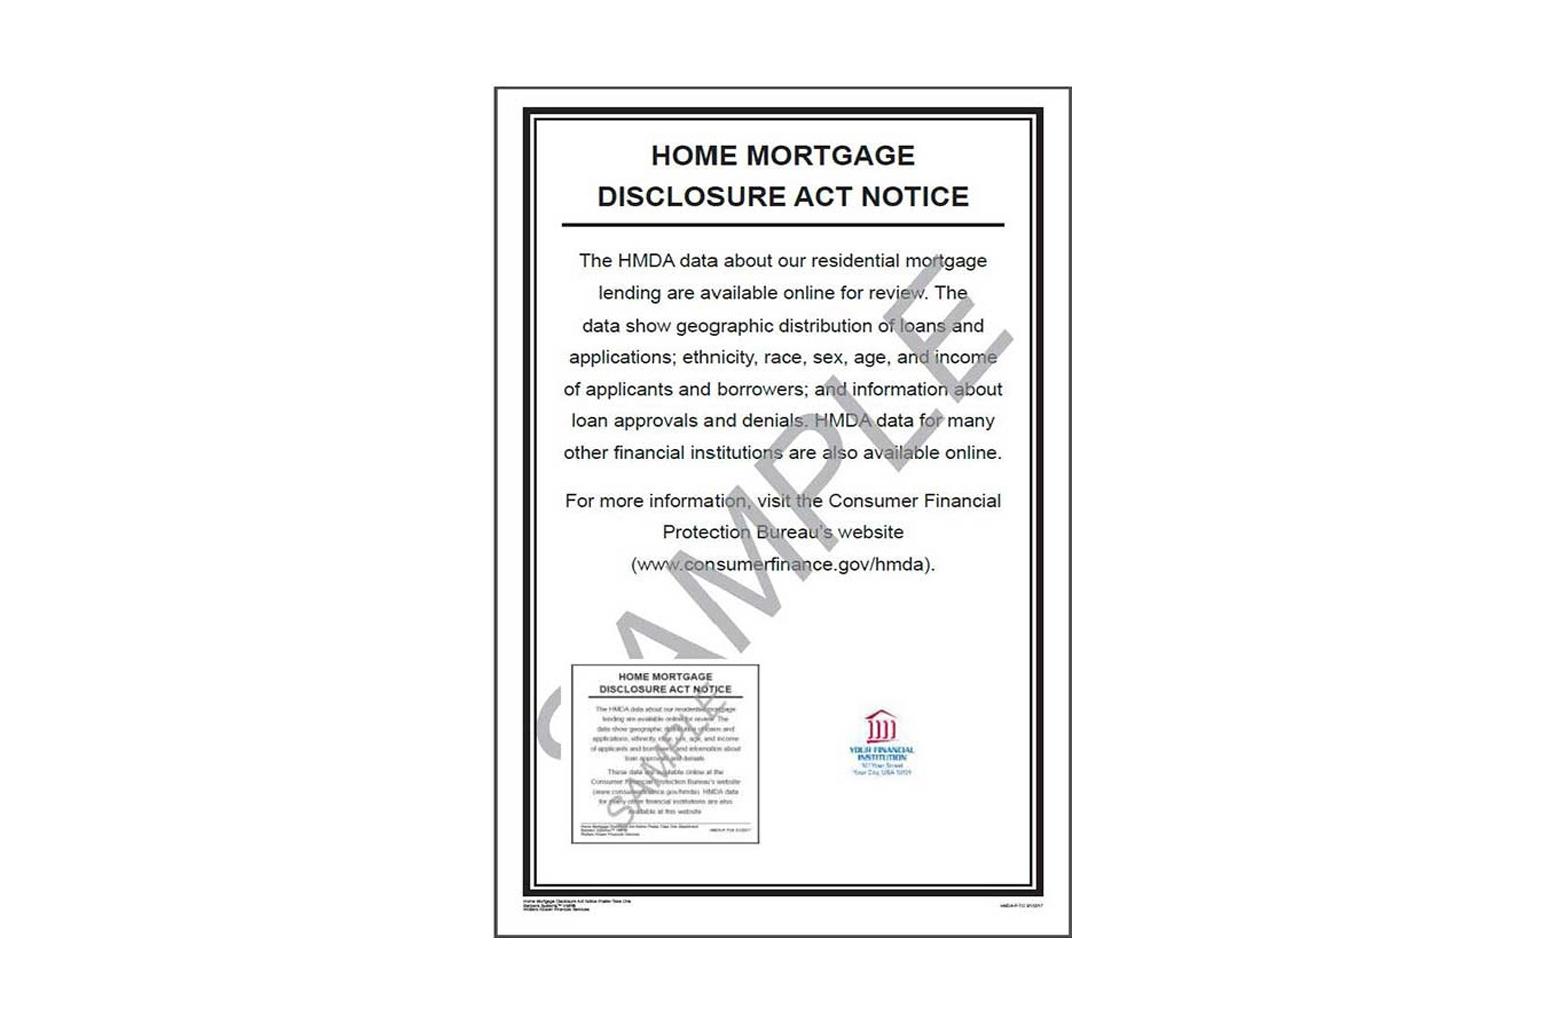 HMDA Notice Poster